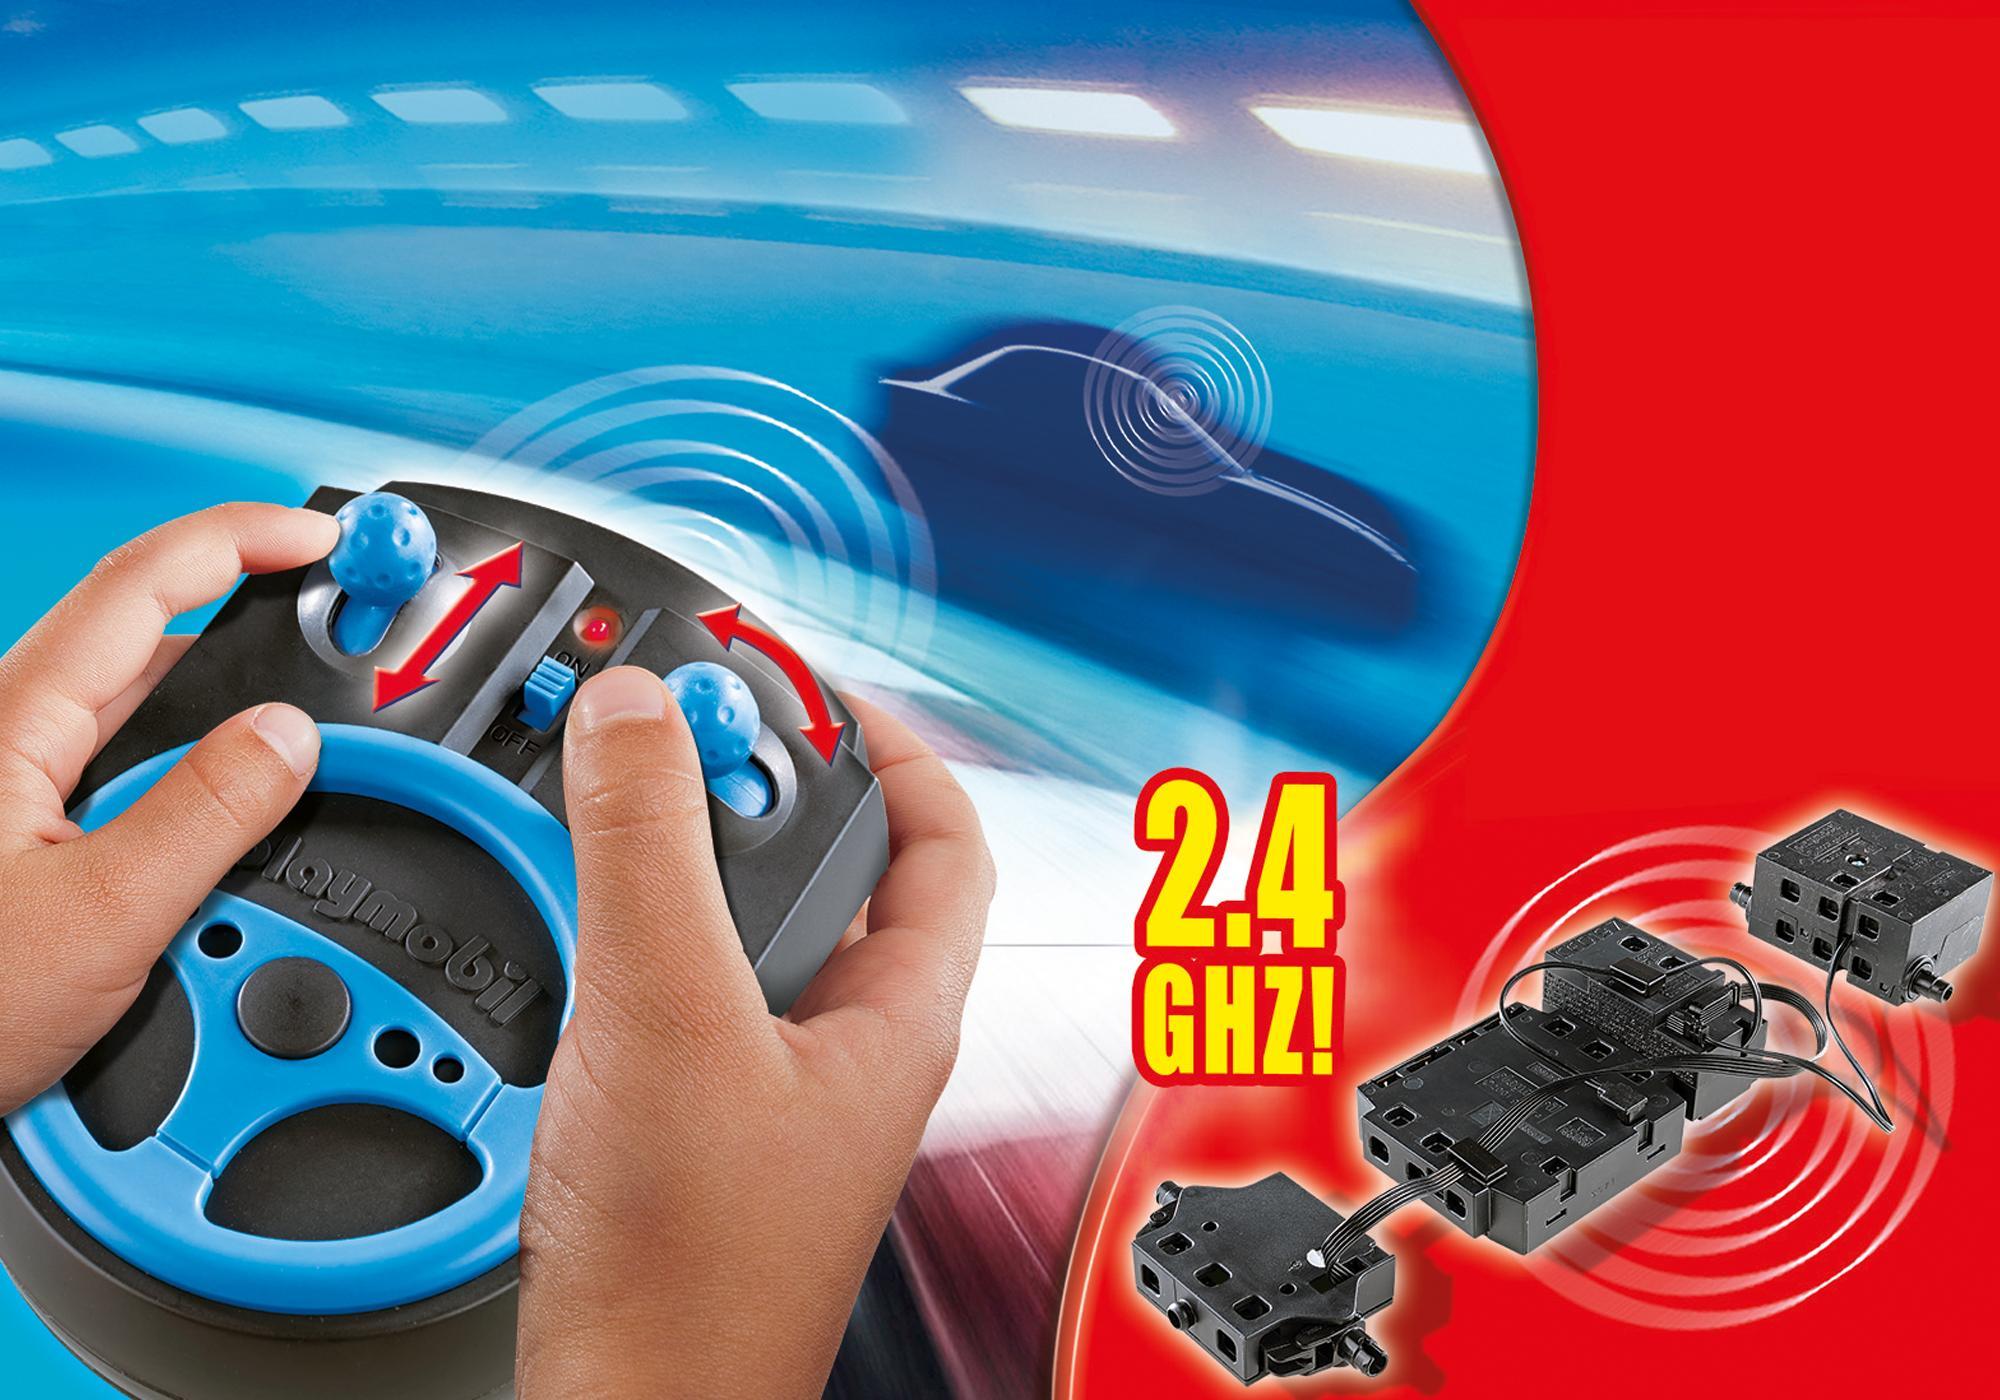 http://media.playmobil.com/i/playmobil/6914_product_detail/Módulo RC Plus